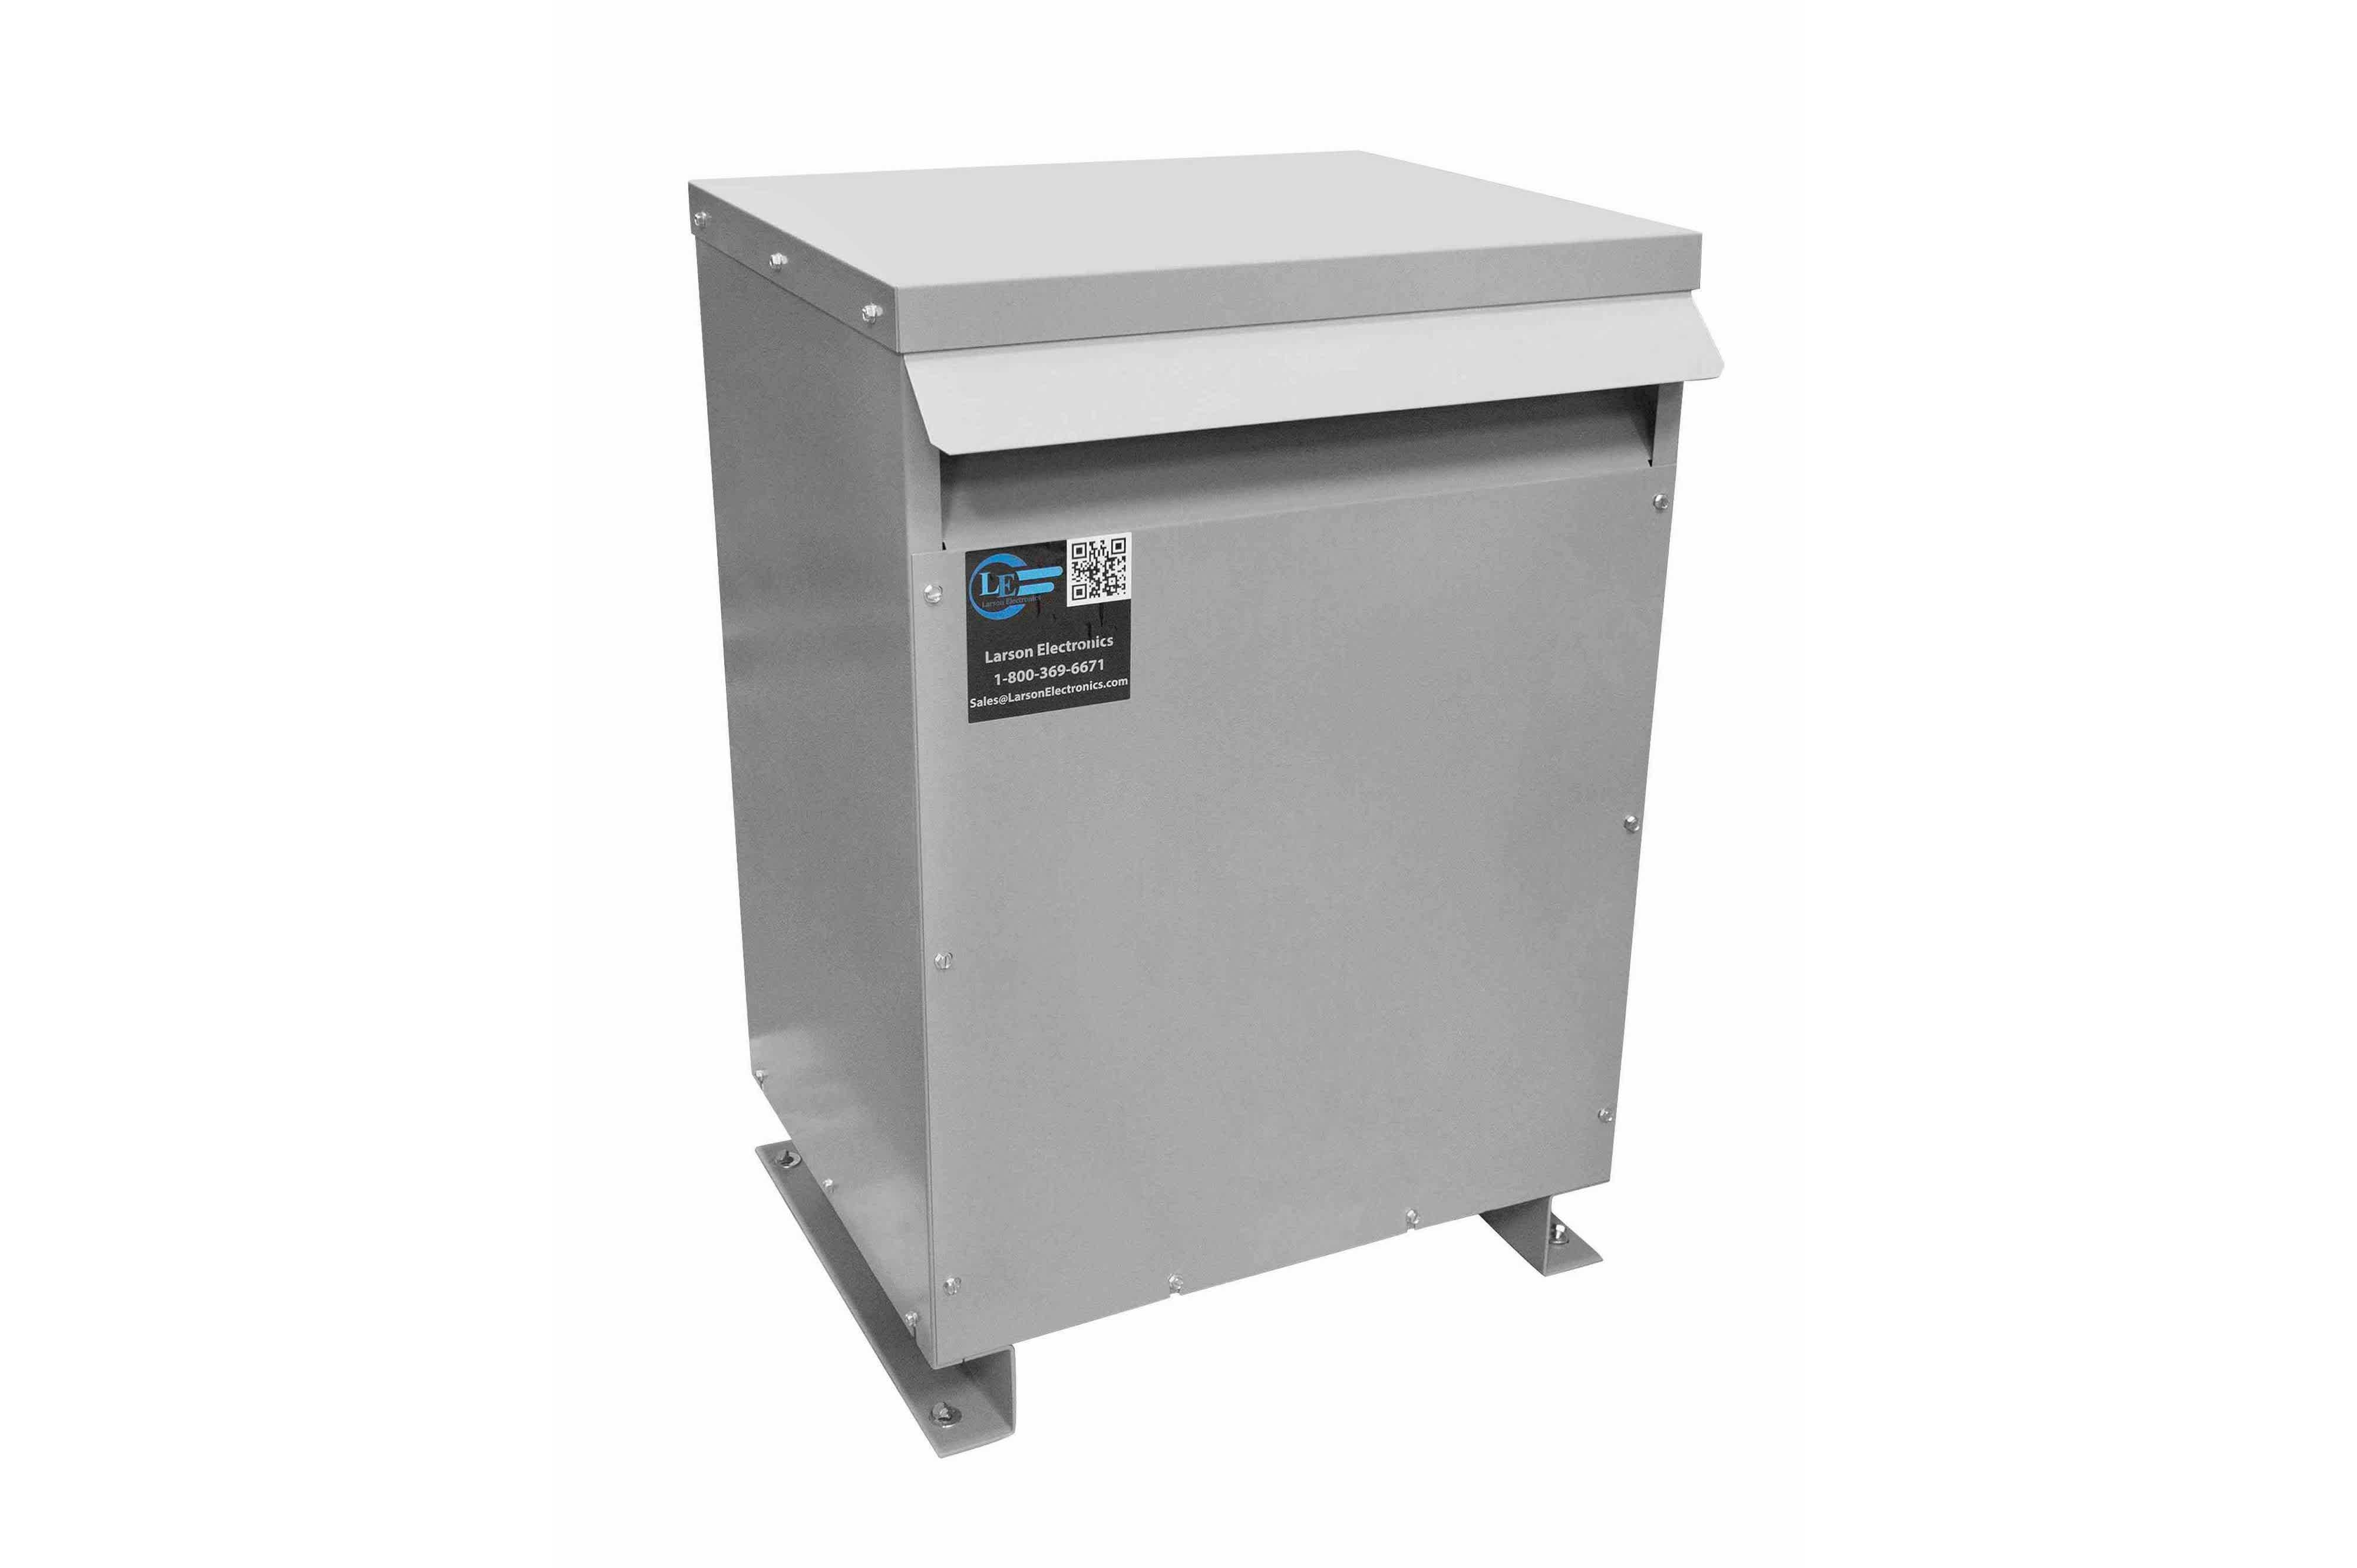 275 kVA 3PH Isolation Transformer, 220V Wye Primary, 208Y/120 Wye-N Secondary, N3R, Ventilated, 60 Hz